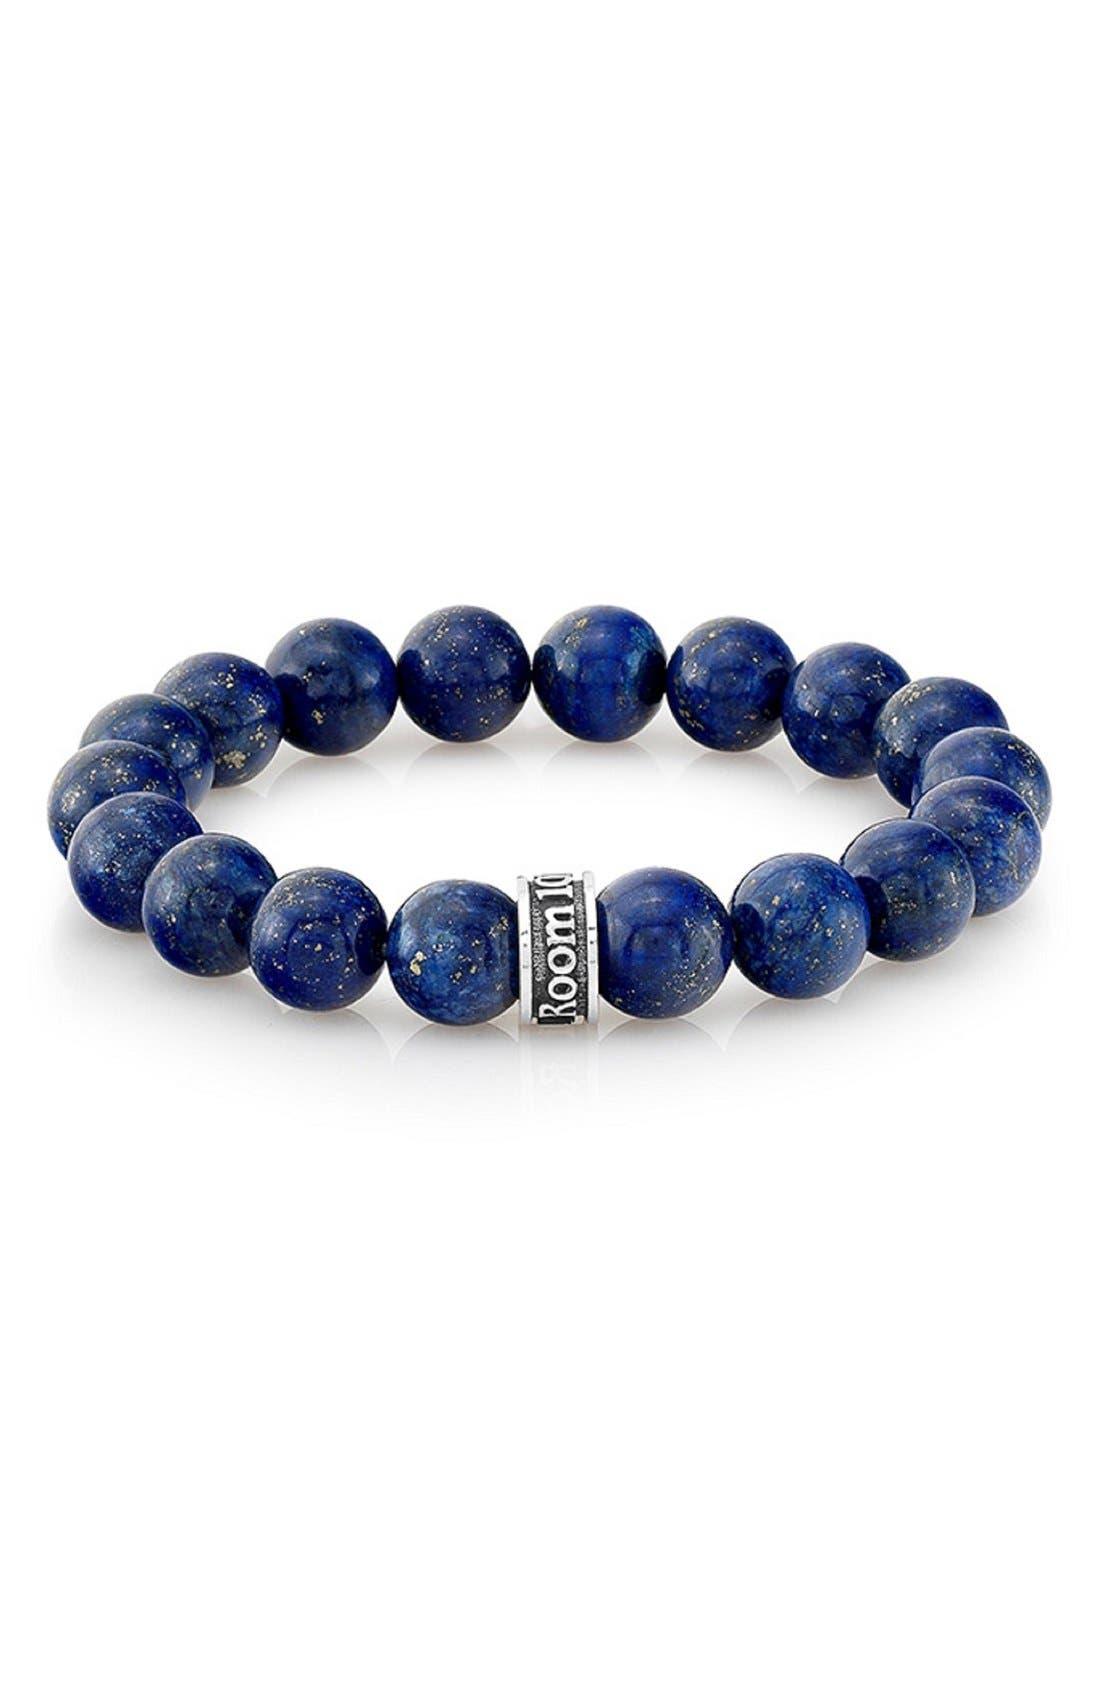 Lapis Lazuli Bead Bracelet,                             Main thumbnail 1, color,                             401